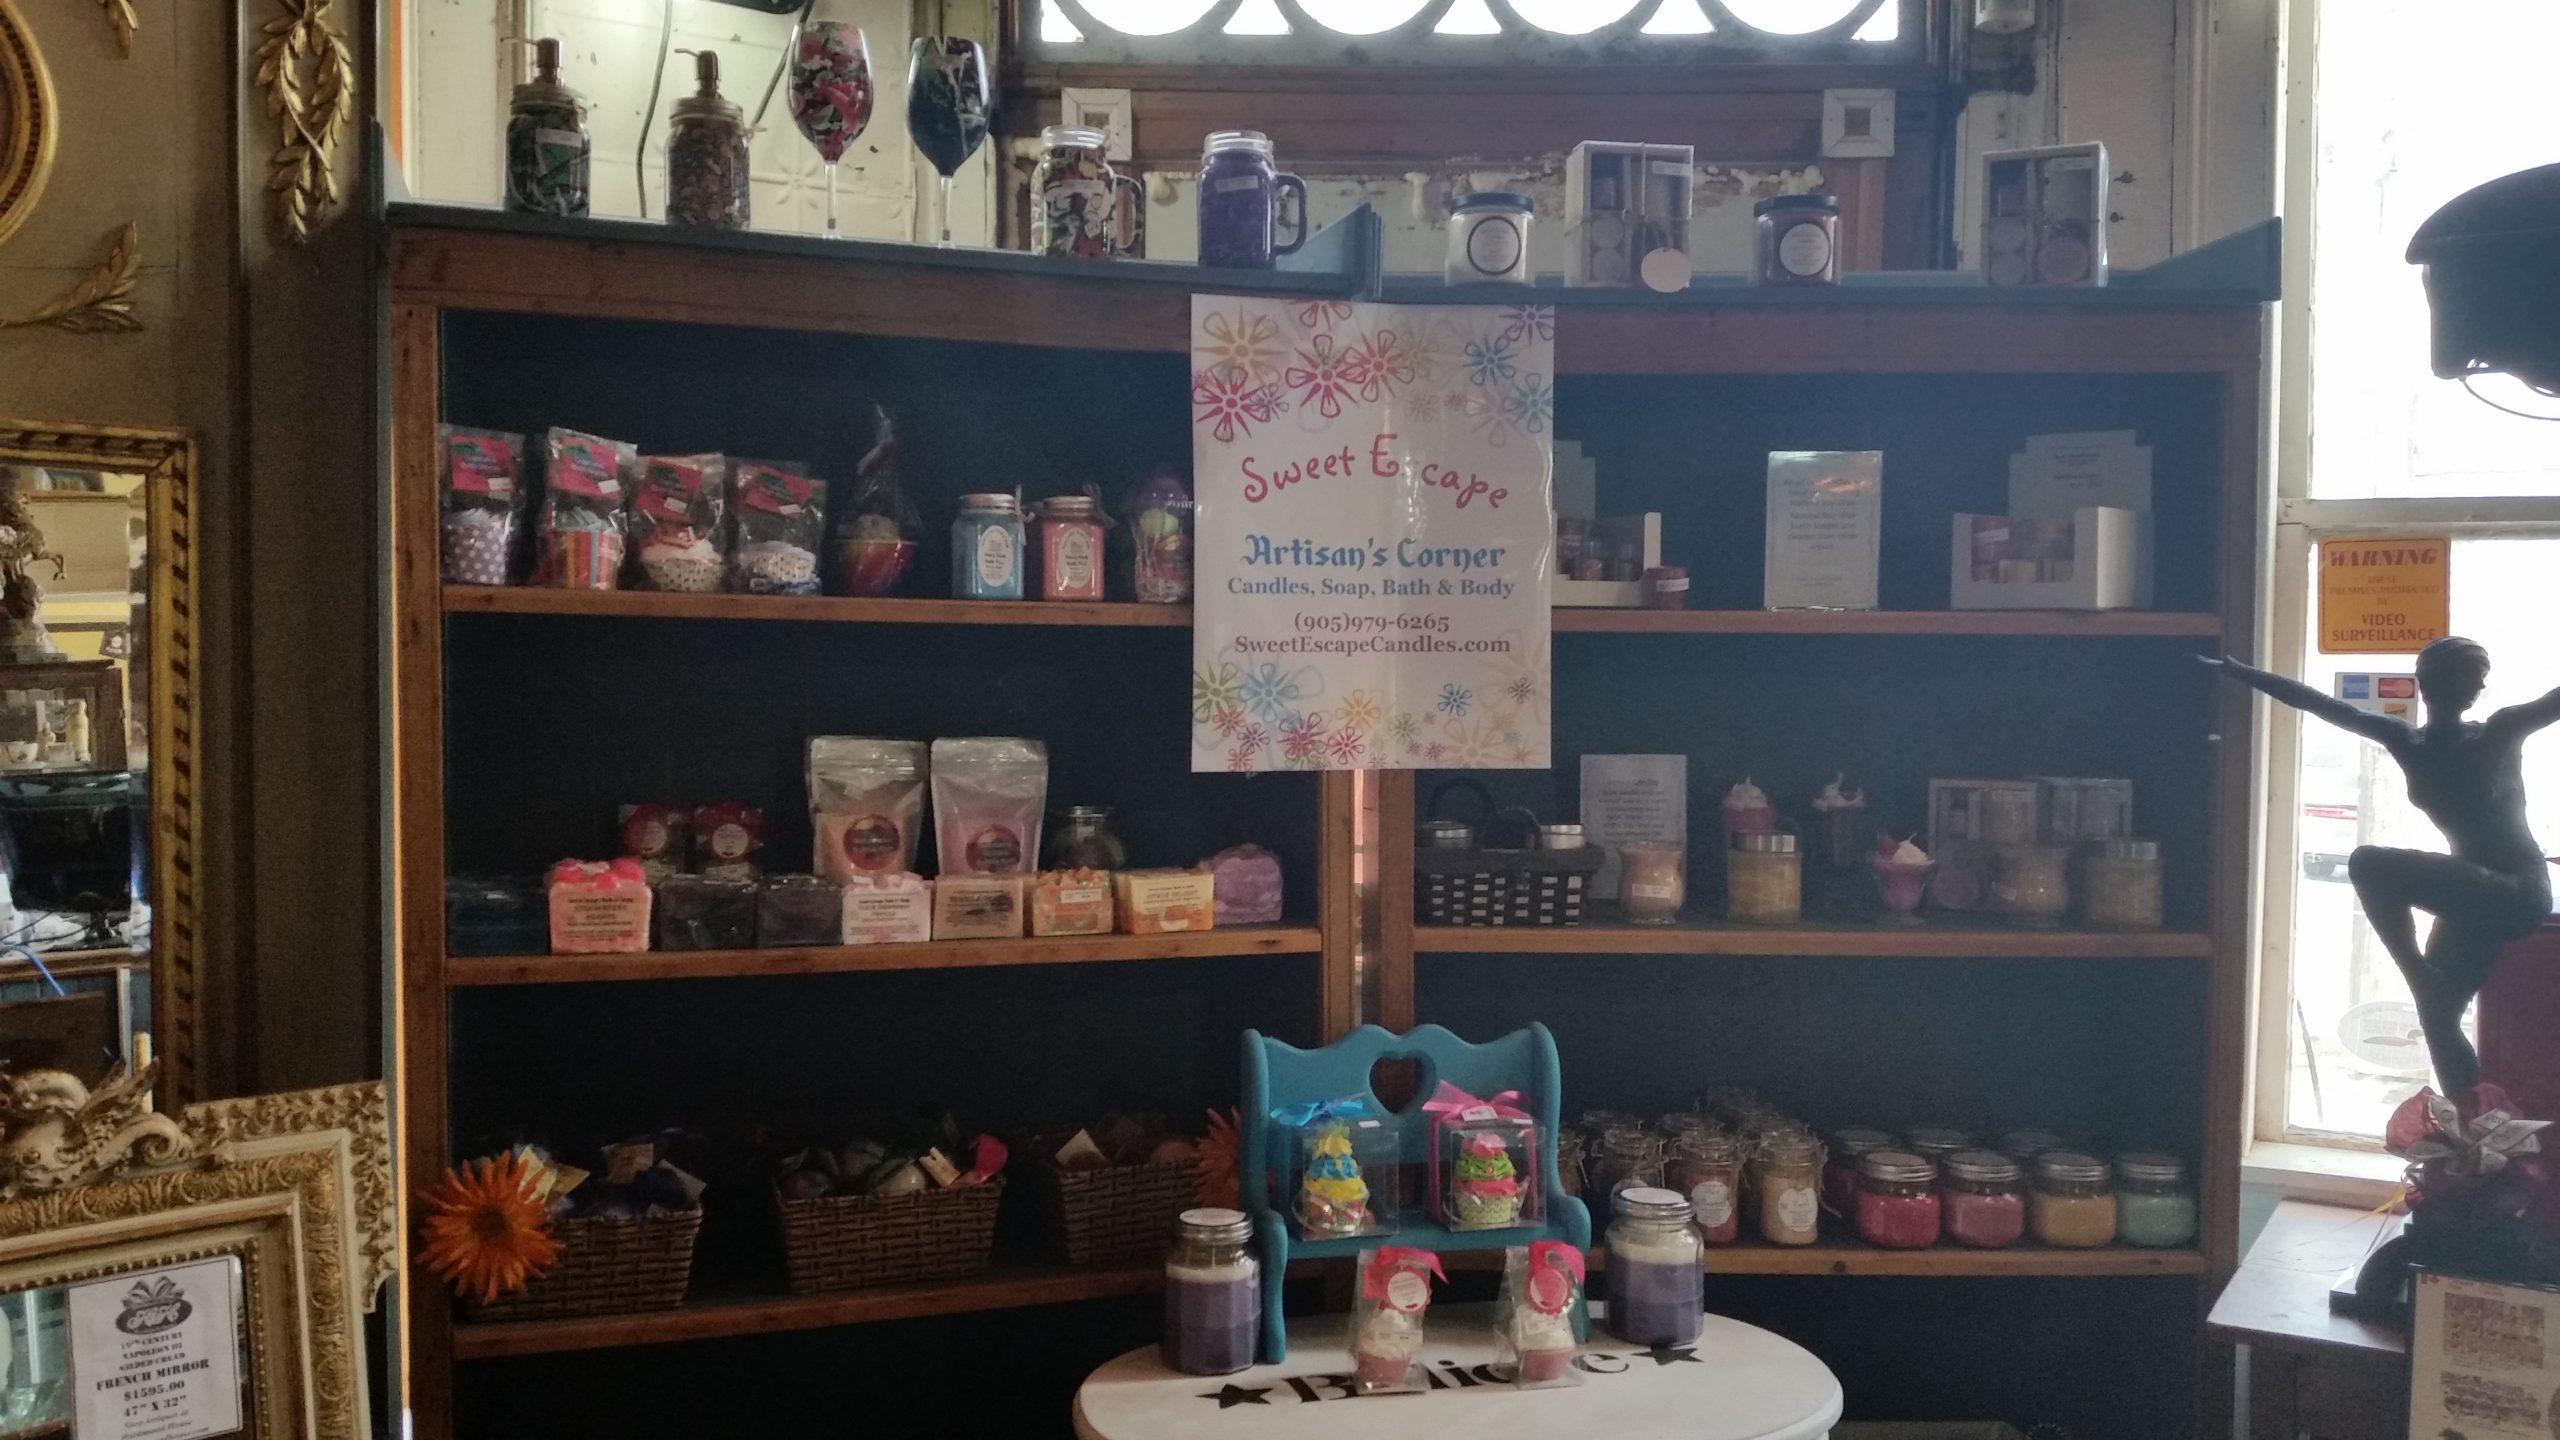 Sweet Escape Candles & Gift Shop